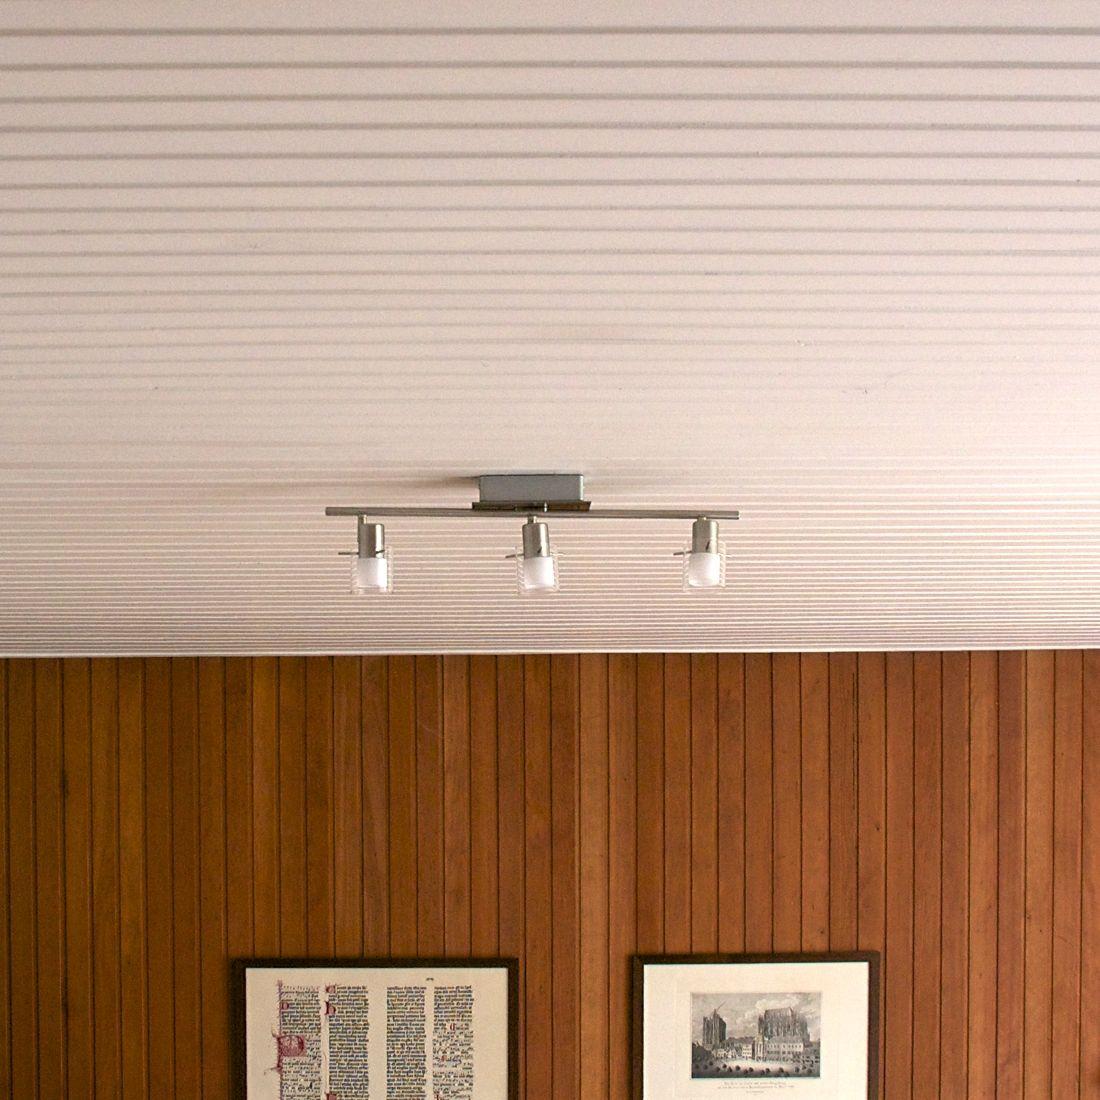 holzdecke selbst streichen schritt f r schritt future home pinterest holzdecke. Black Bedroom Furniture Sets. Home Design Ideas